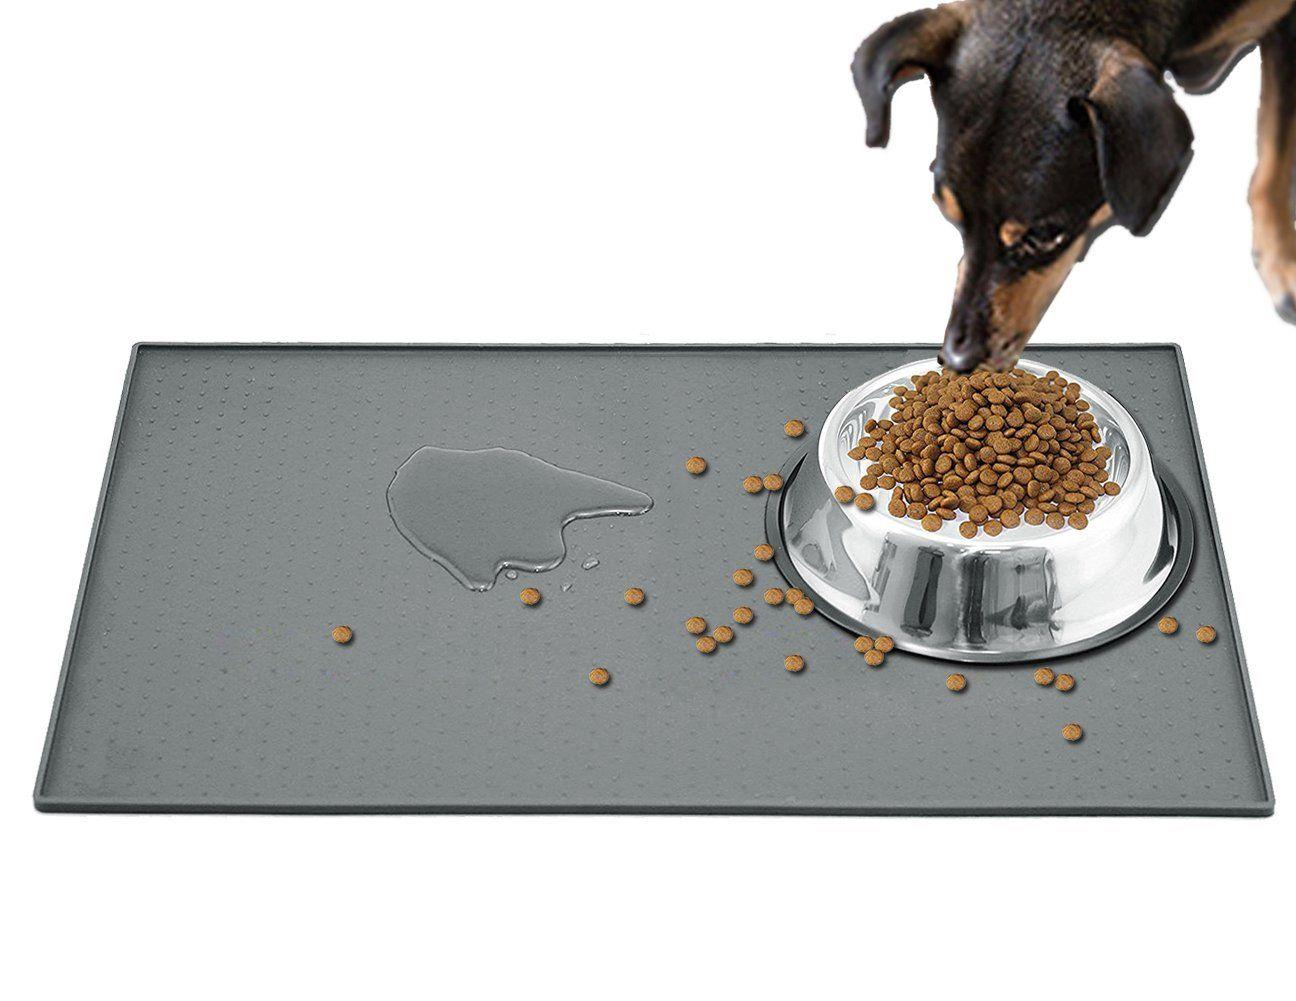 ttw com waterproof mats premium amazon dog petpawjoy food pet grade mat dp approved feeding silicone